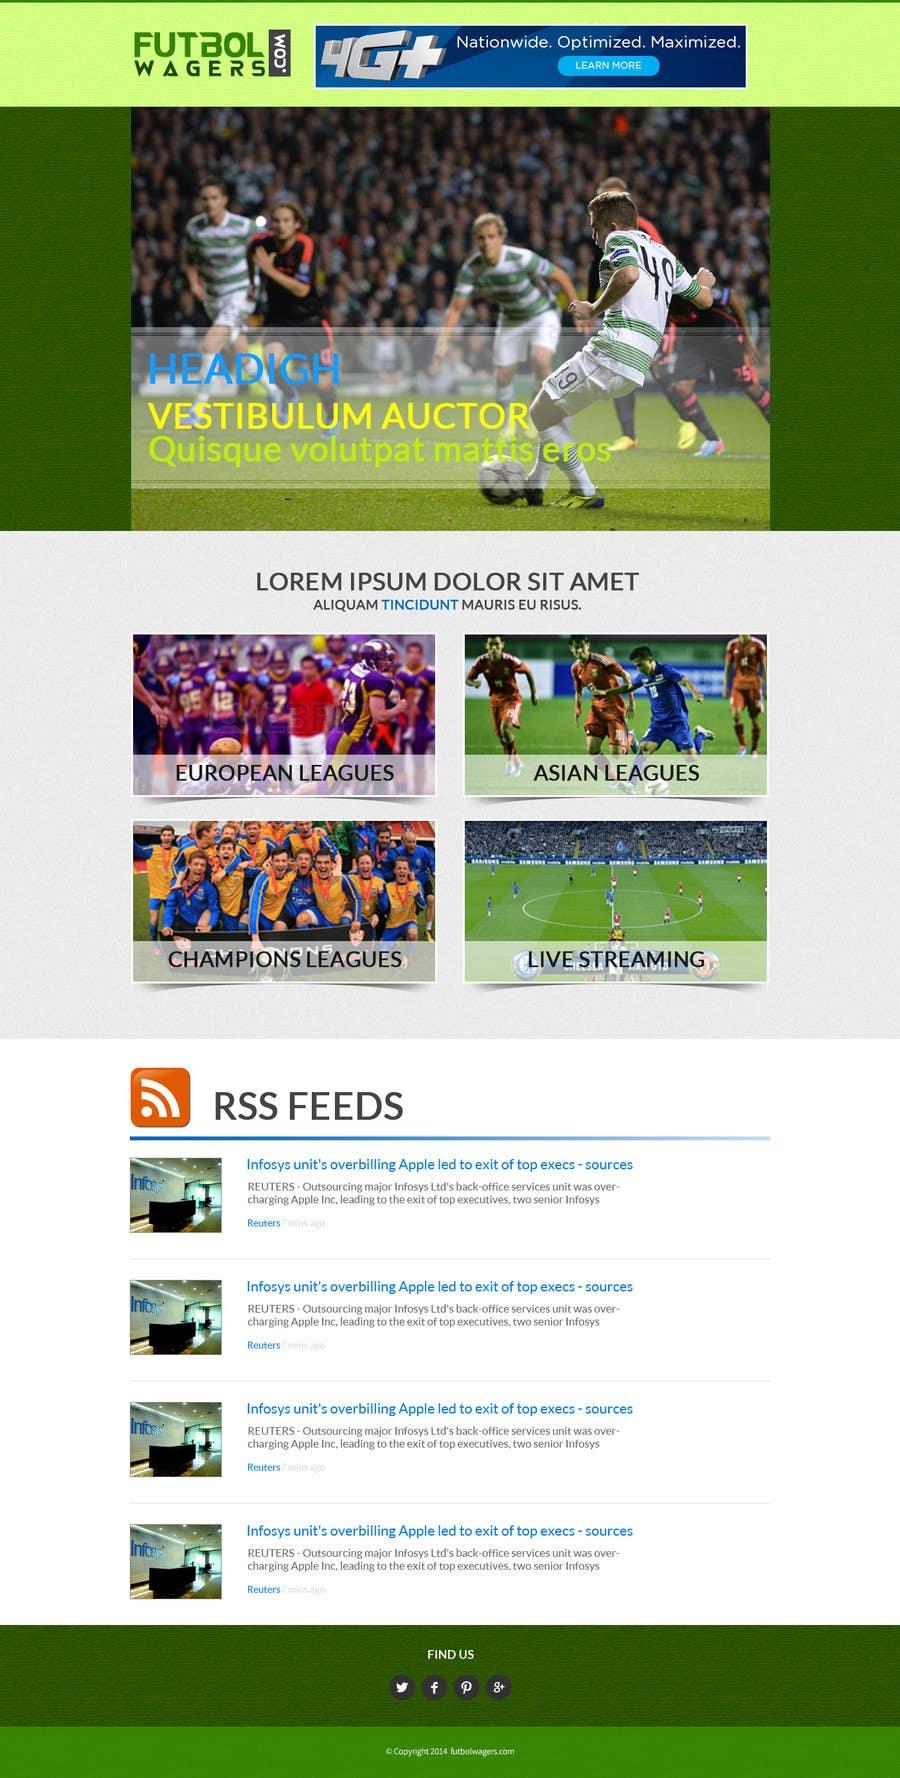 Bài tham dự cuộc thi #                                        7                                      cho                                         Homepage Mockup for a football affiliate betting site